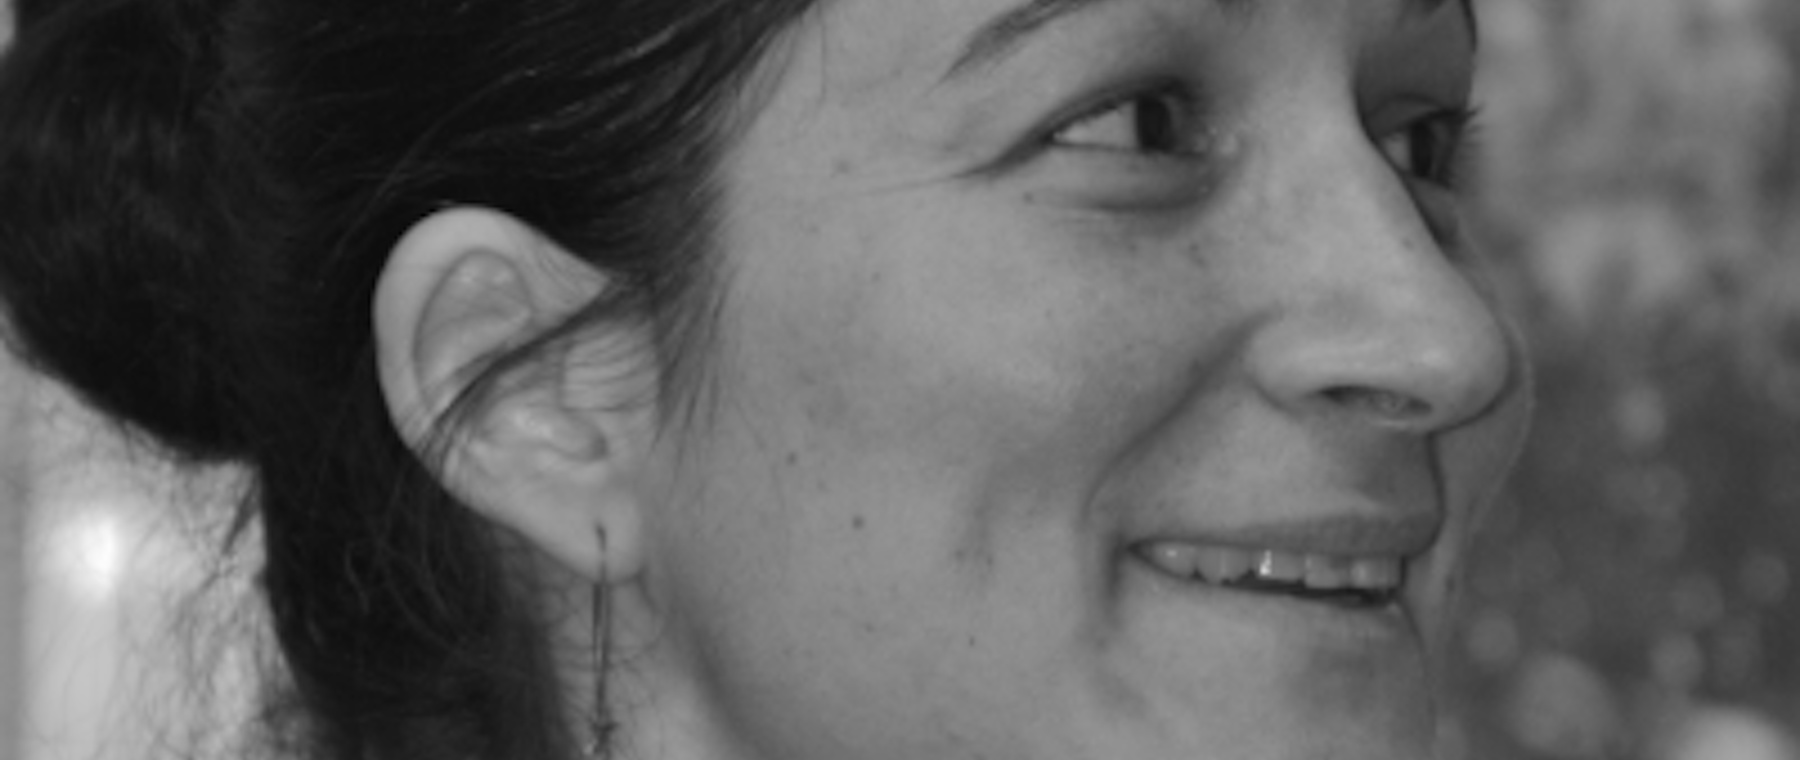 Emilie Wichroff © directrice syndicat haut rhone